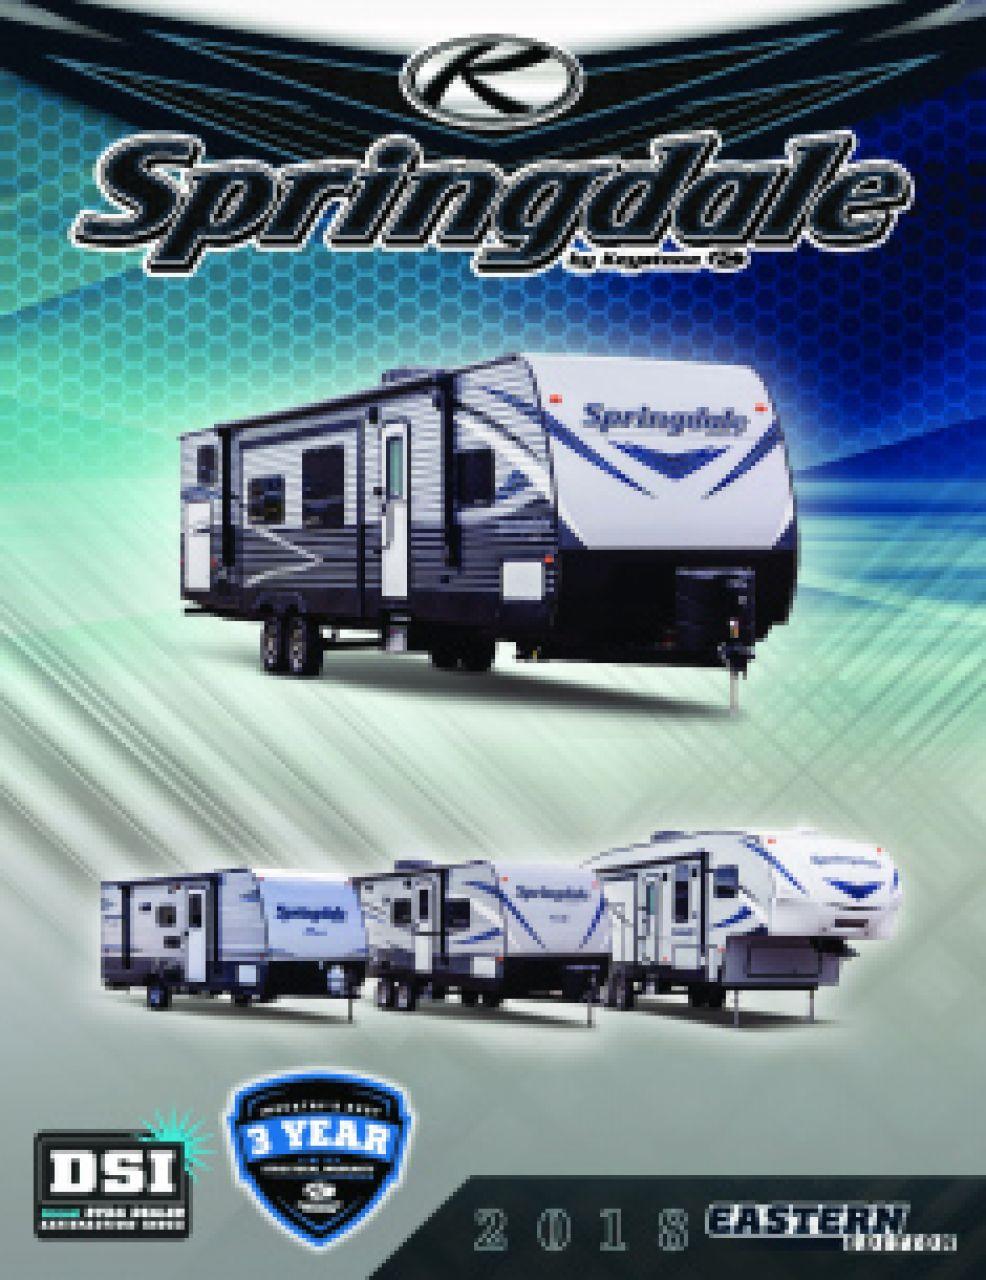 springdale-2019-broch-lsrv-001-pdf